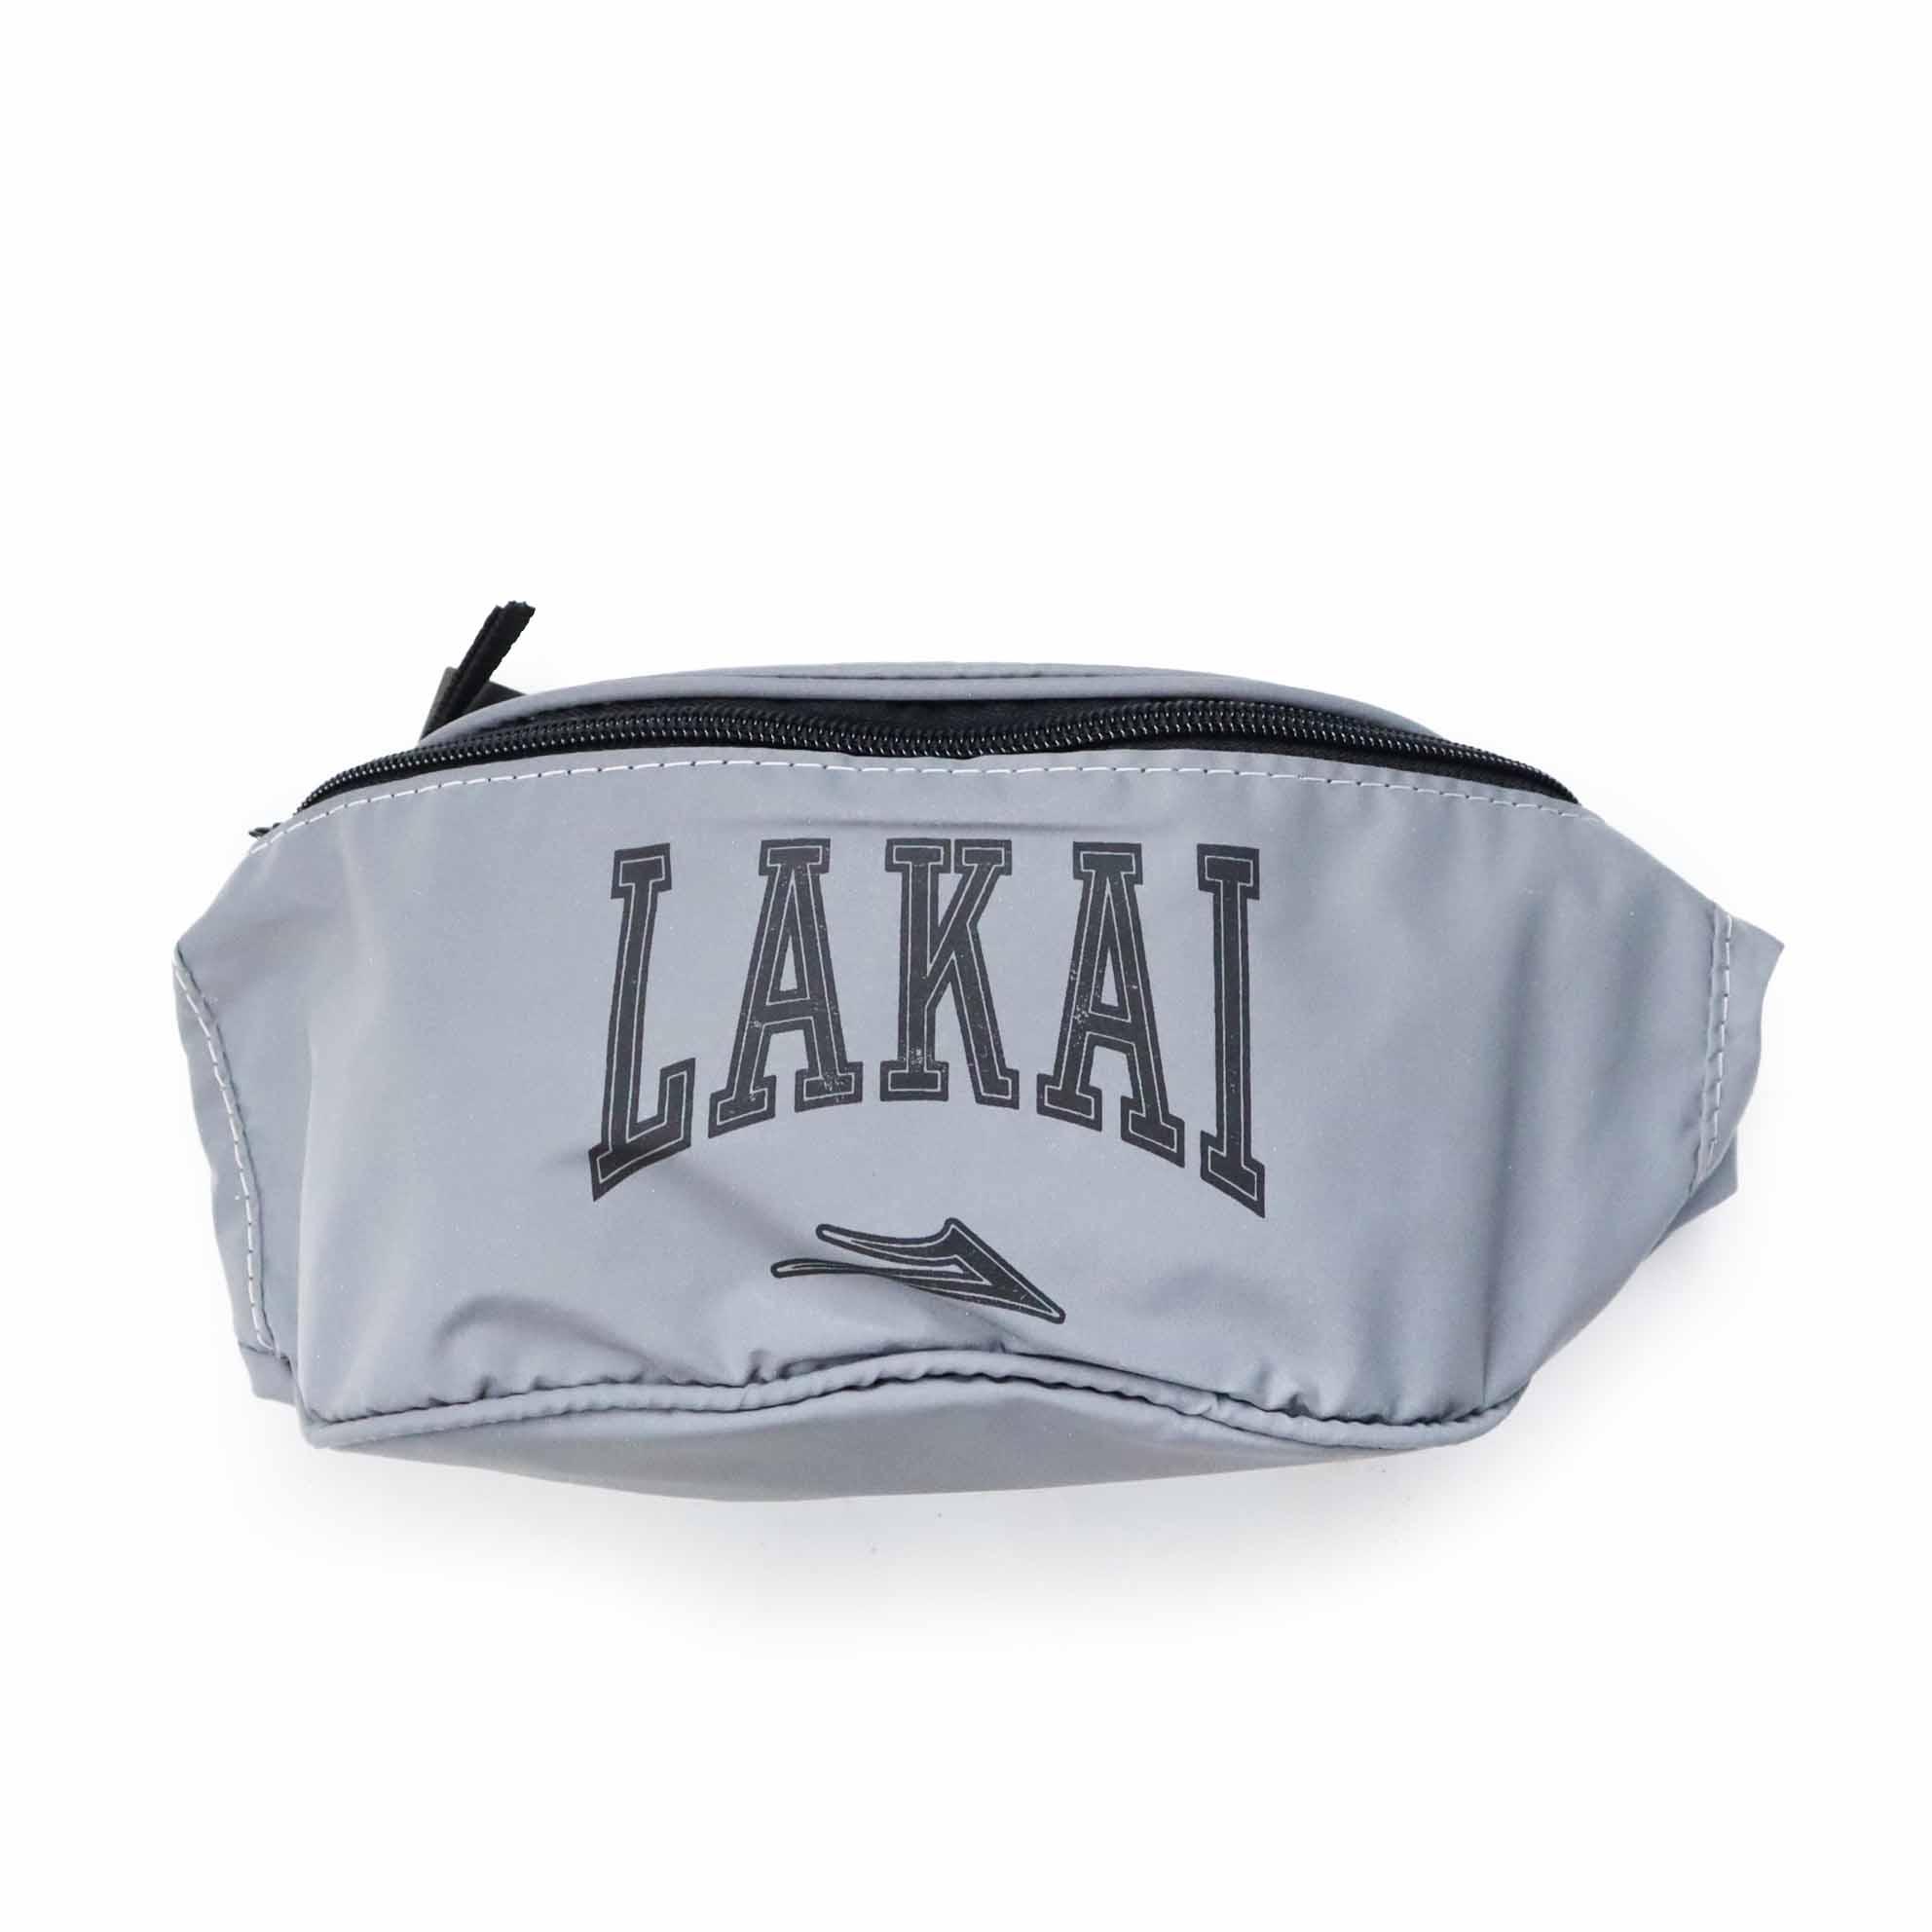 Pochete Lakai - Cinza (Refletivo)